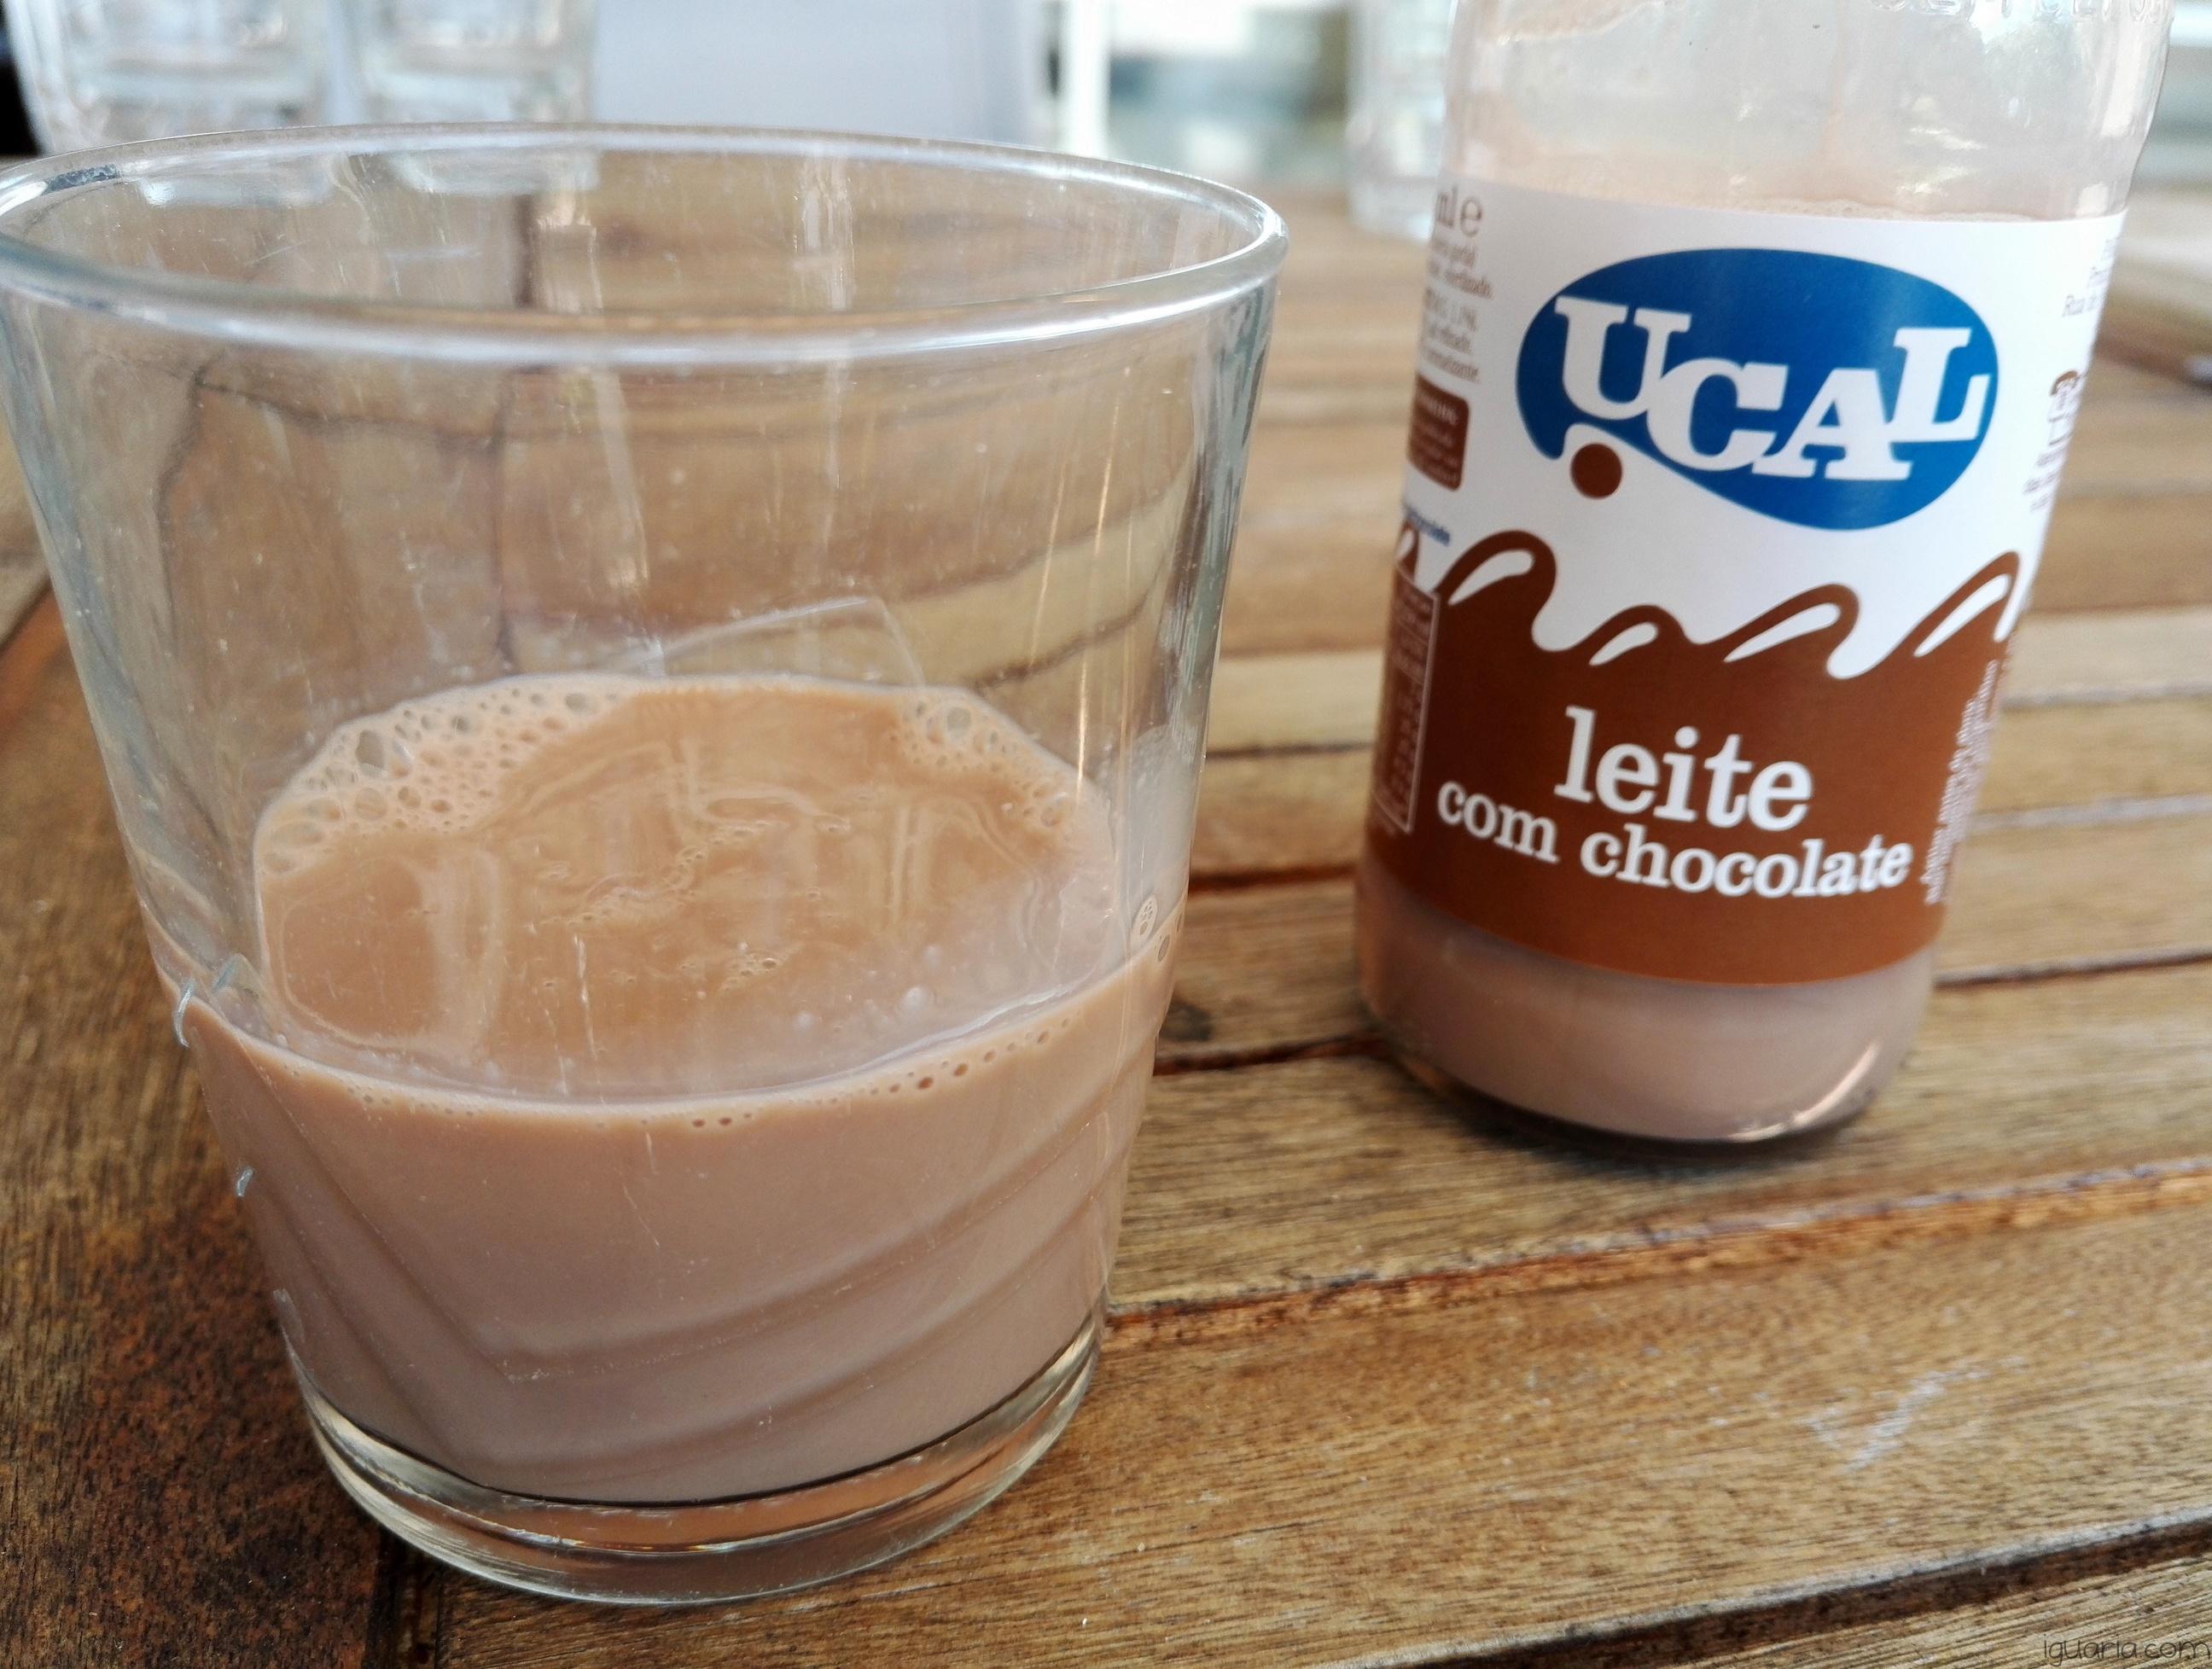 Iguaria_UCAL-Leite-Chocolate